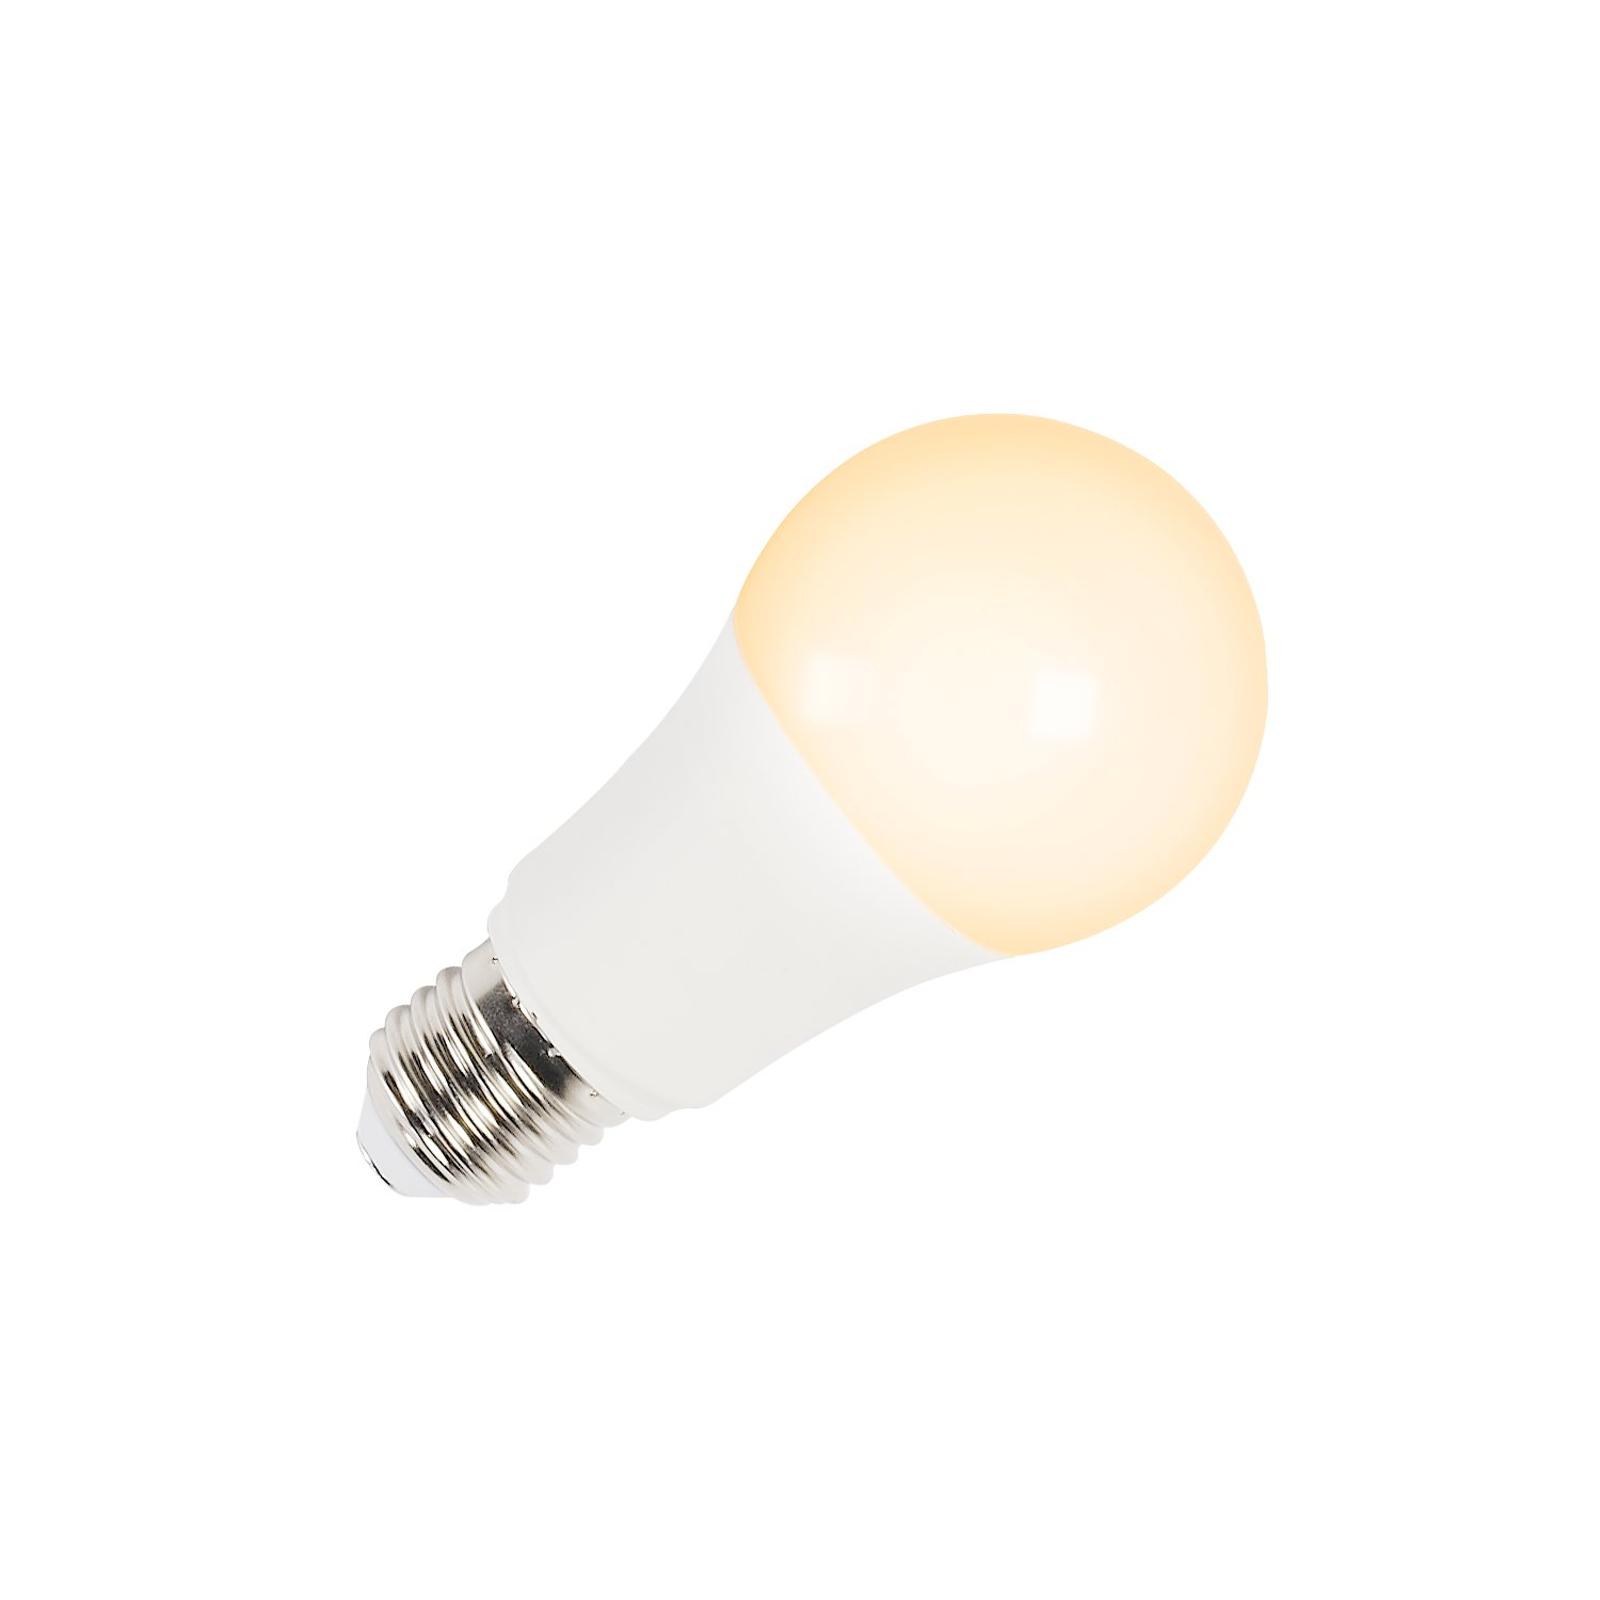 SLV VALETO LED-Lampe E27 A60 9W 2.700-6.500K 806lm